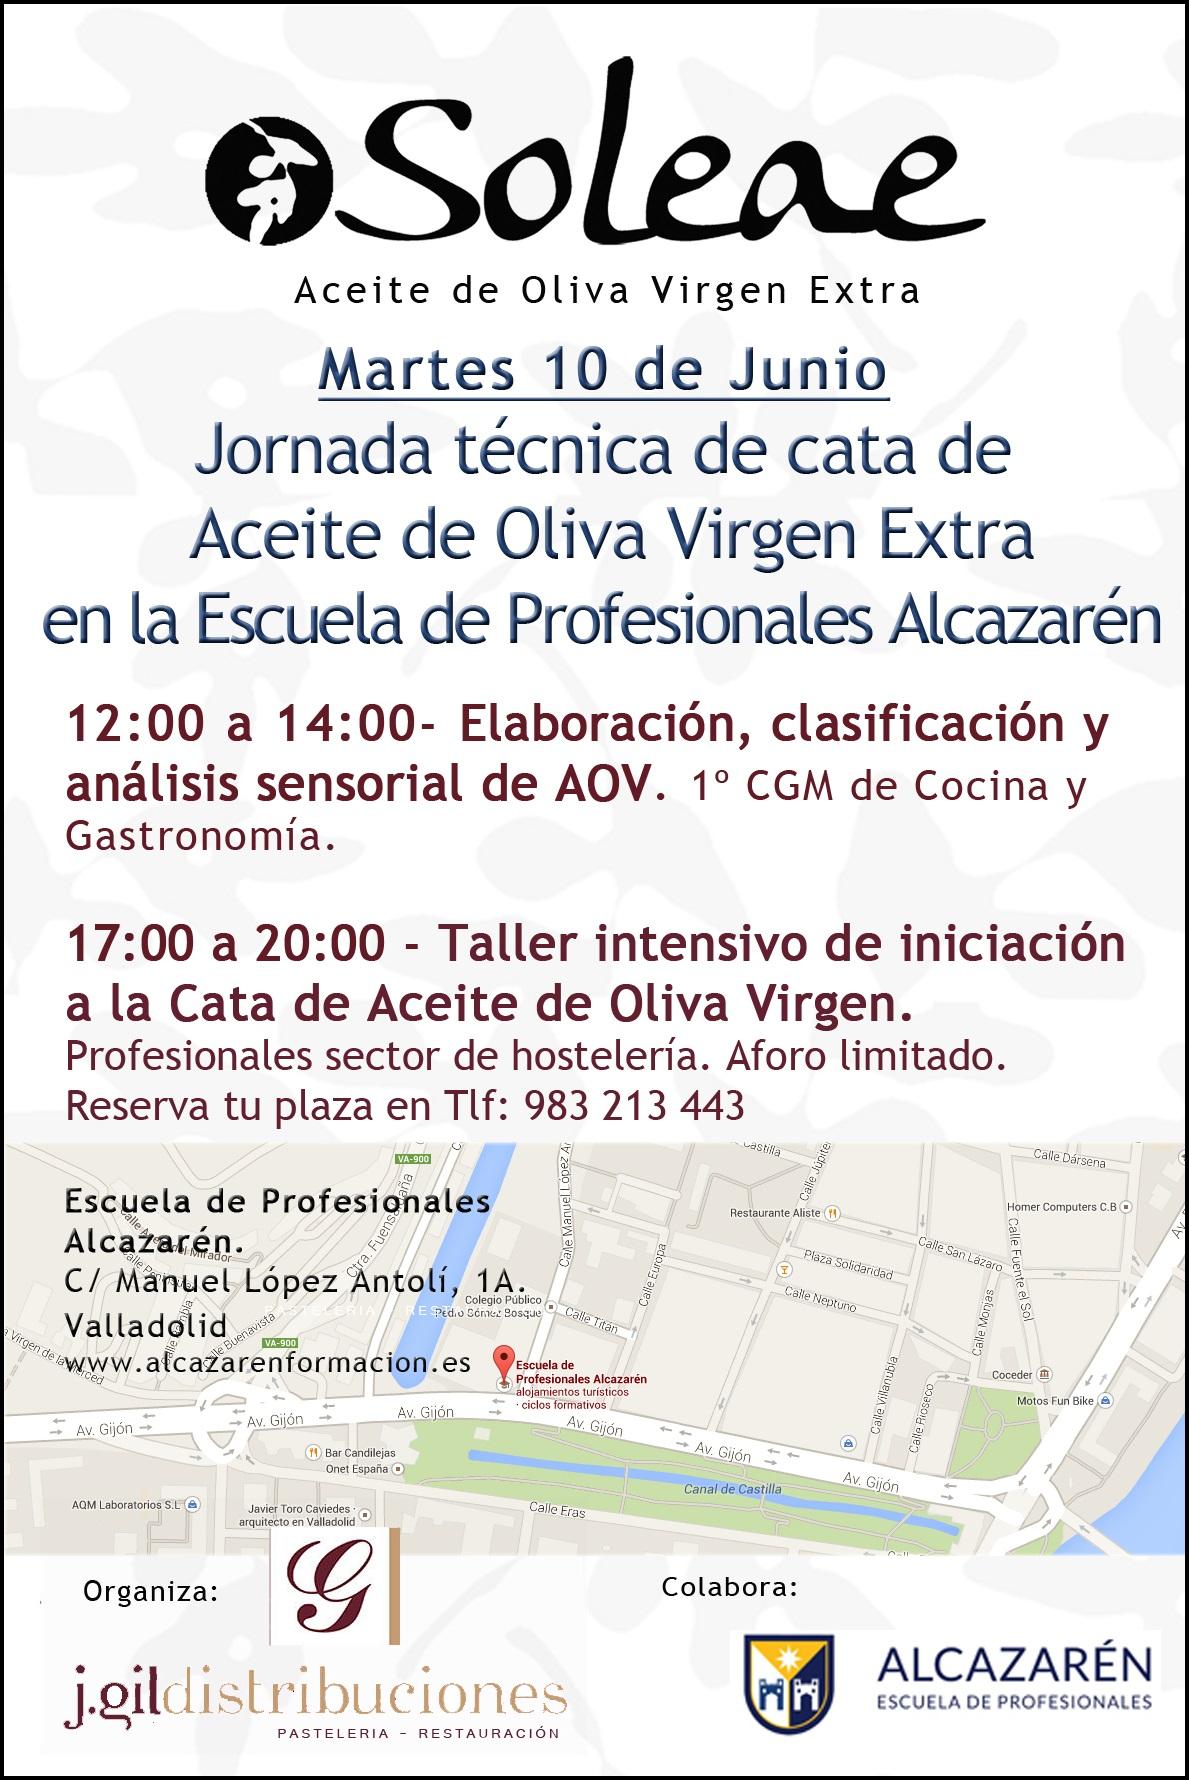 Jornada técnica de cata en Valladolid